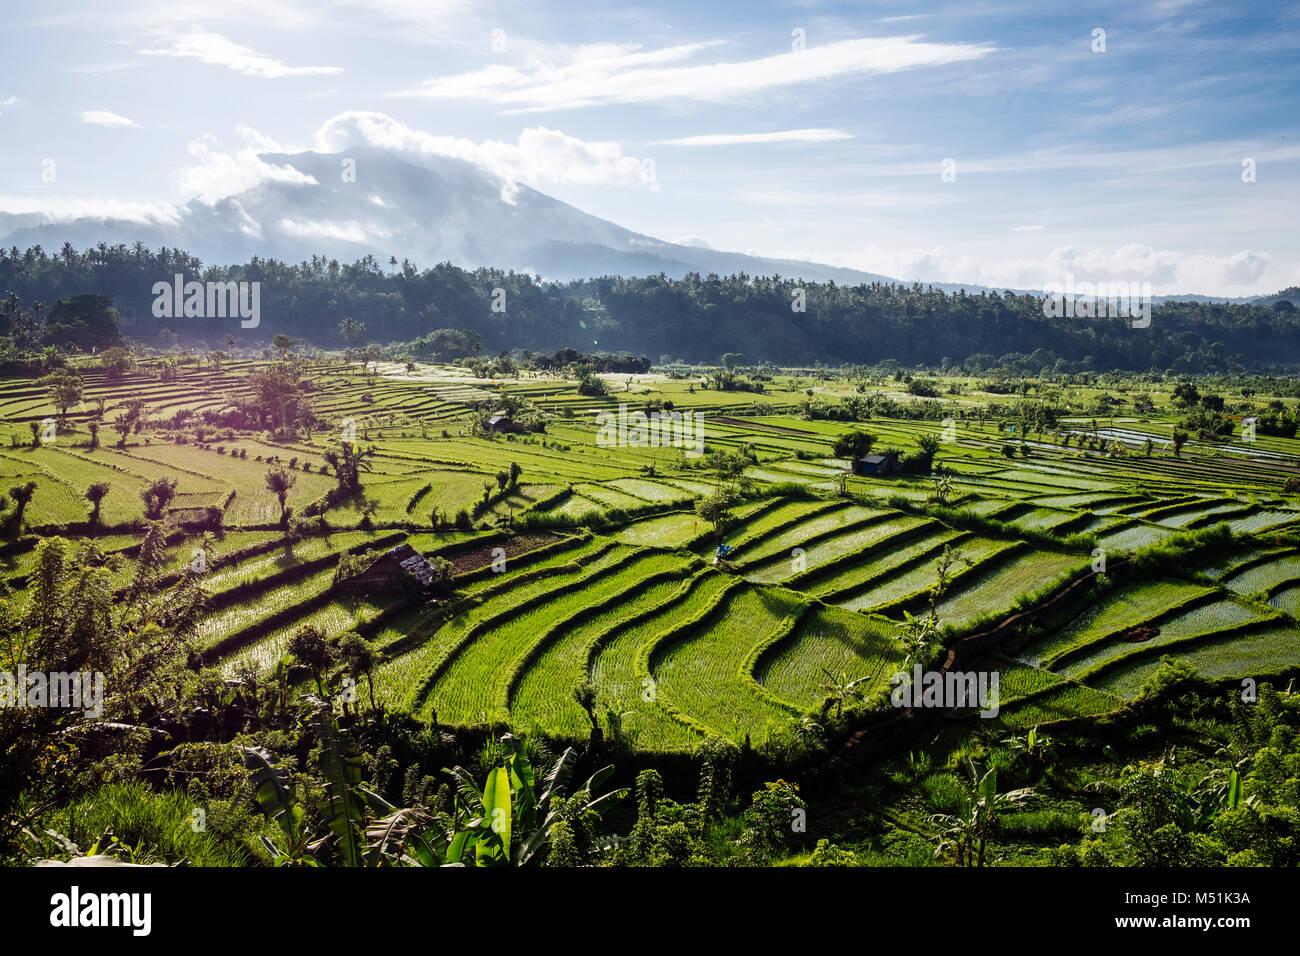 Agung volcano (Gunung Agung) seen over rice terraces from the West, Karangasem Regency, Bali, Indonesia. - Stock Image